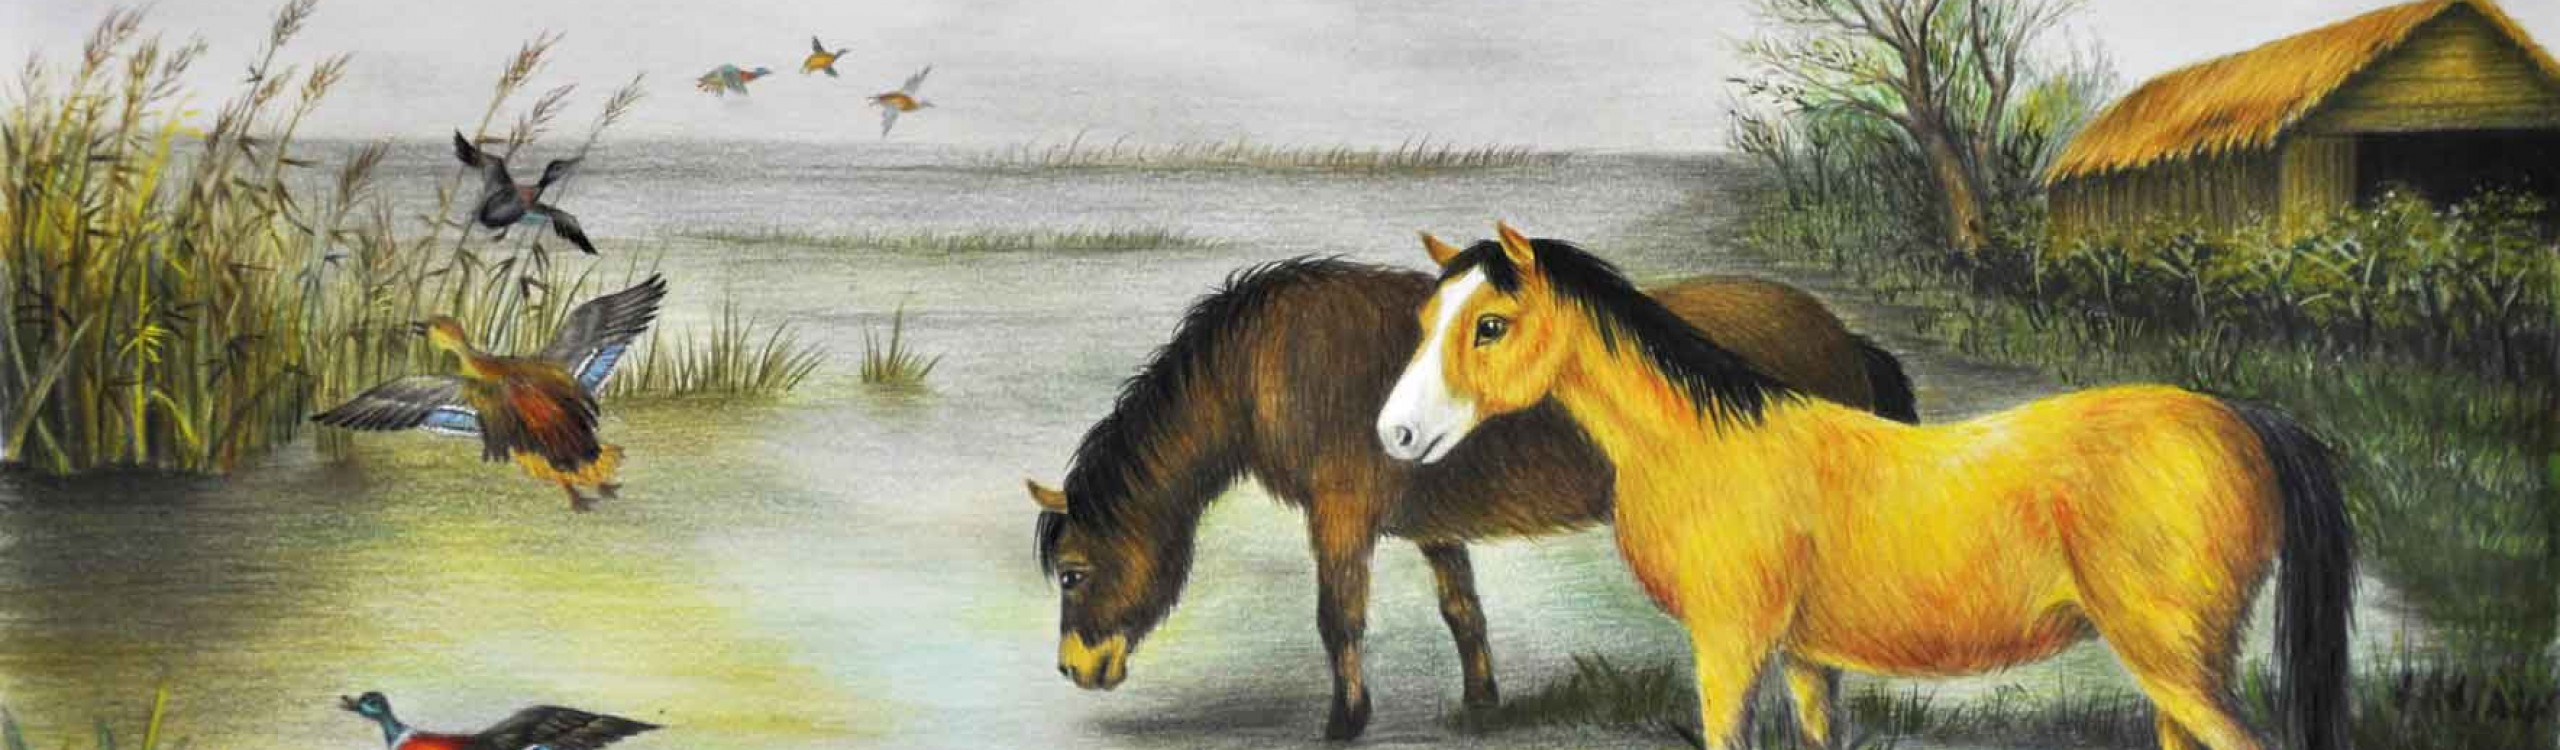 تابلوی اسب ها لب برکه